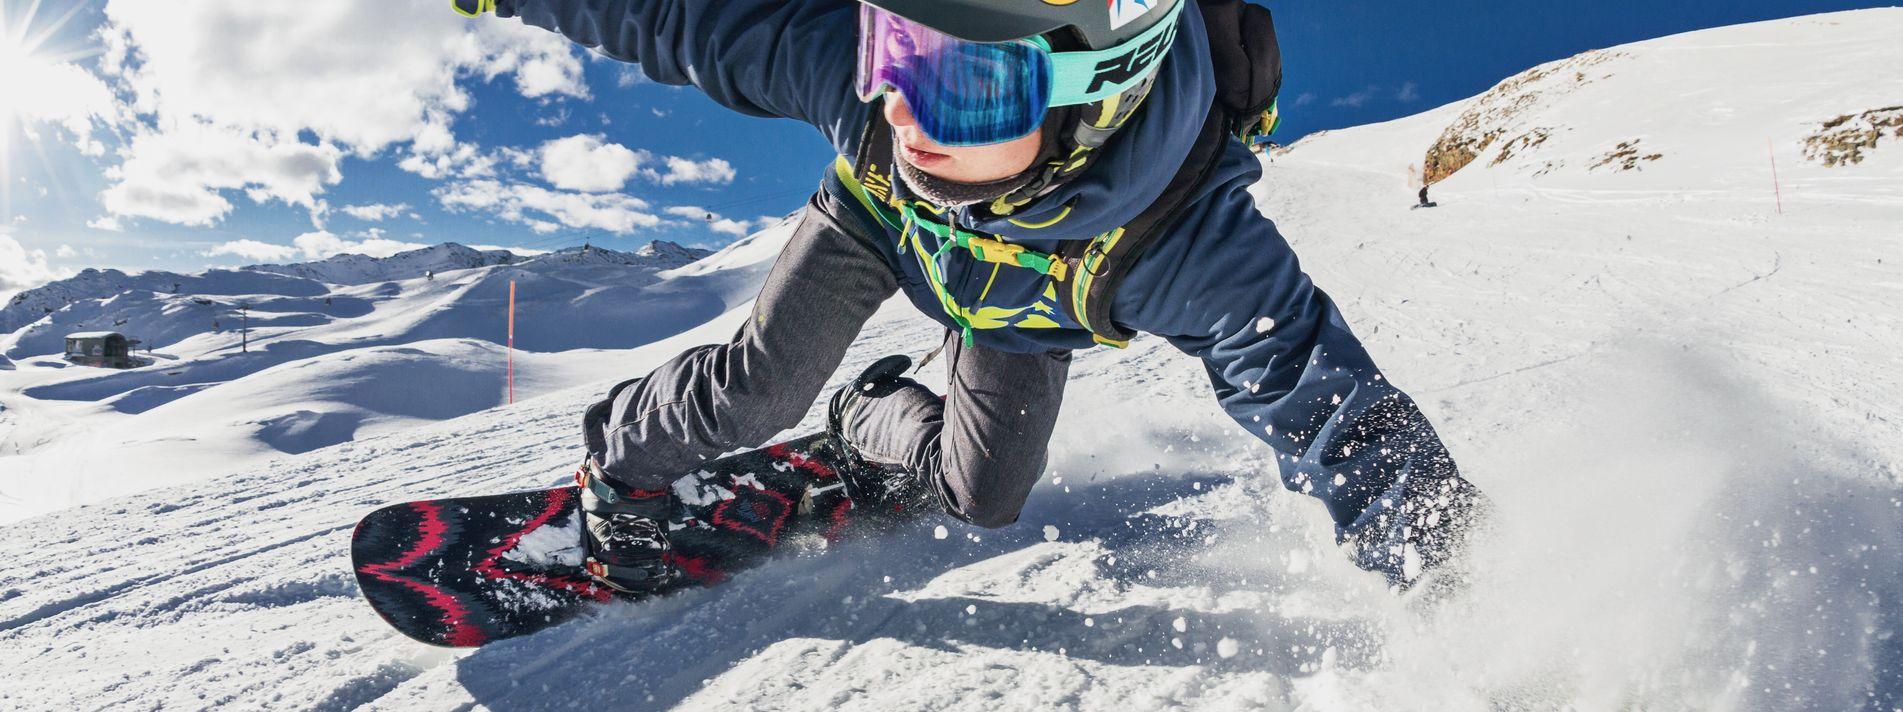 Cursuri snowboard copii si adulti | Sport Ski Club | Brasov